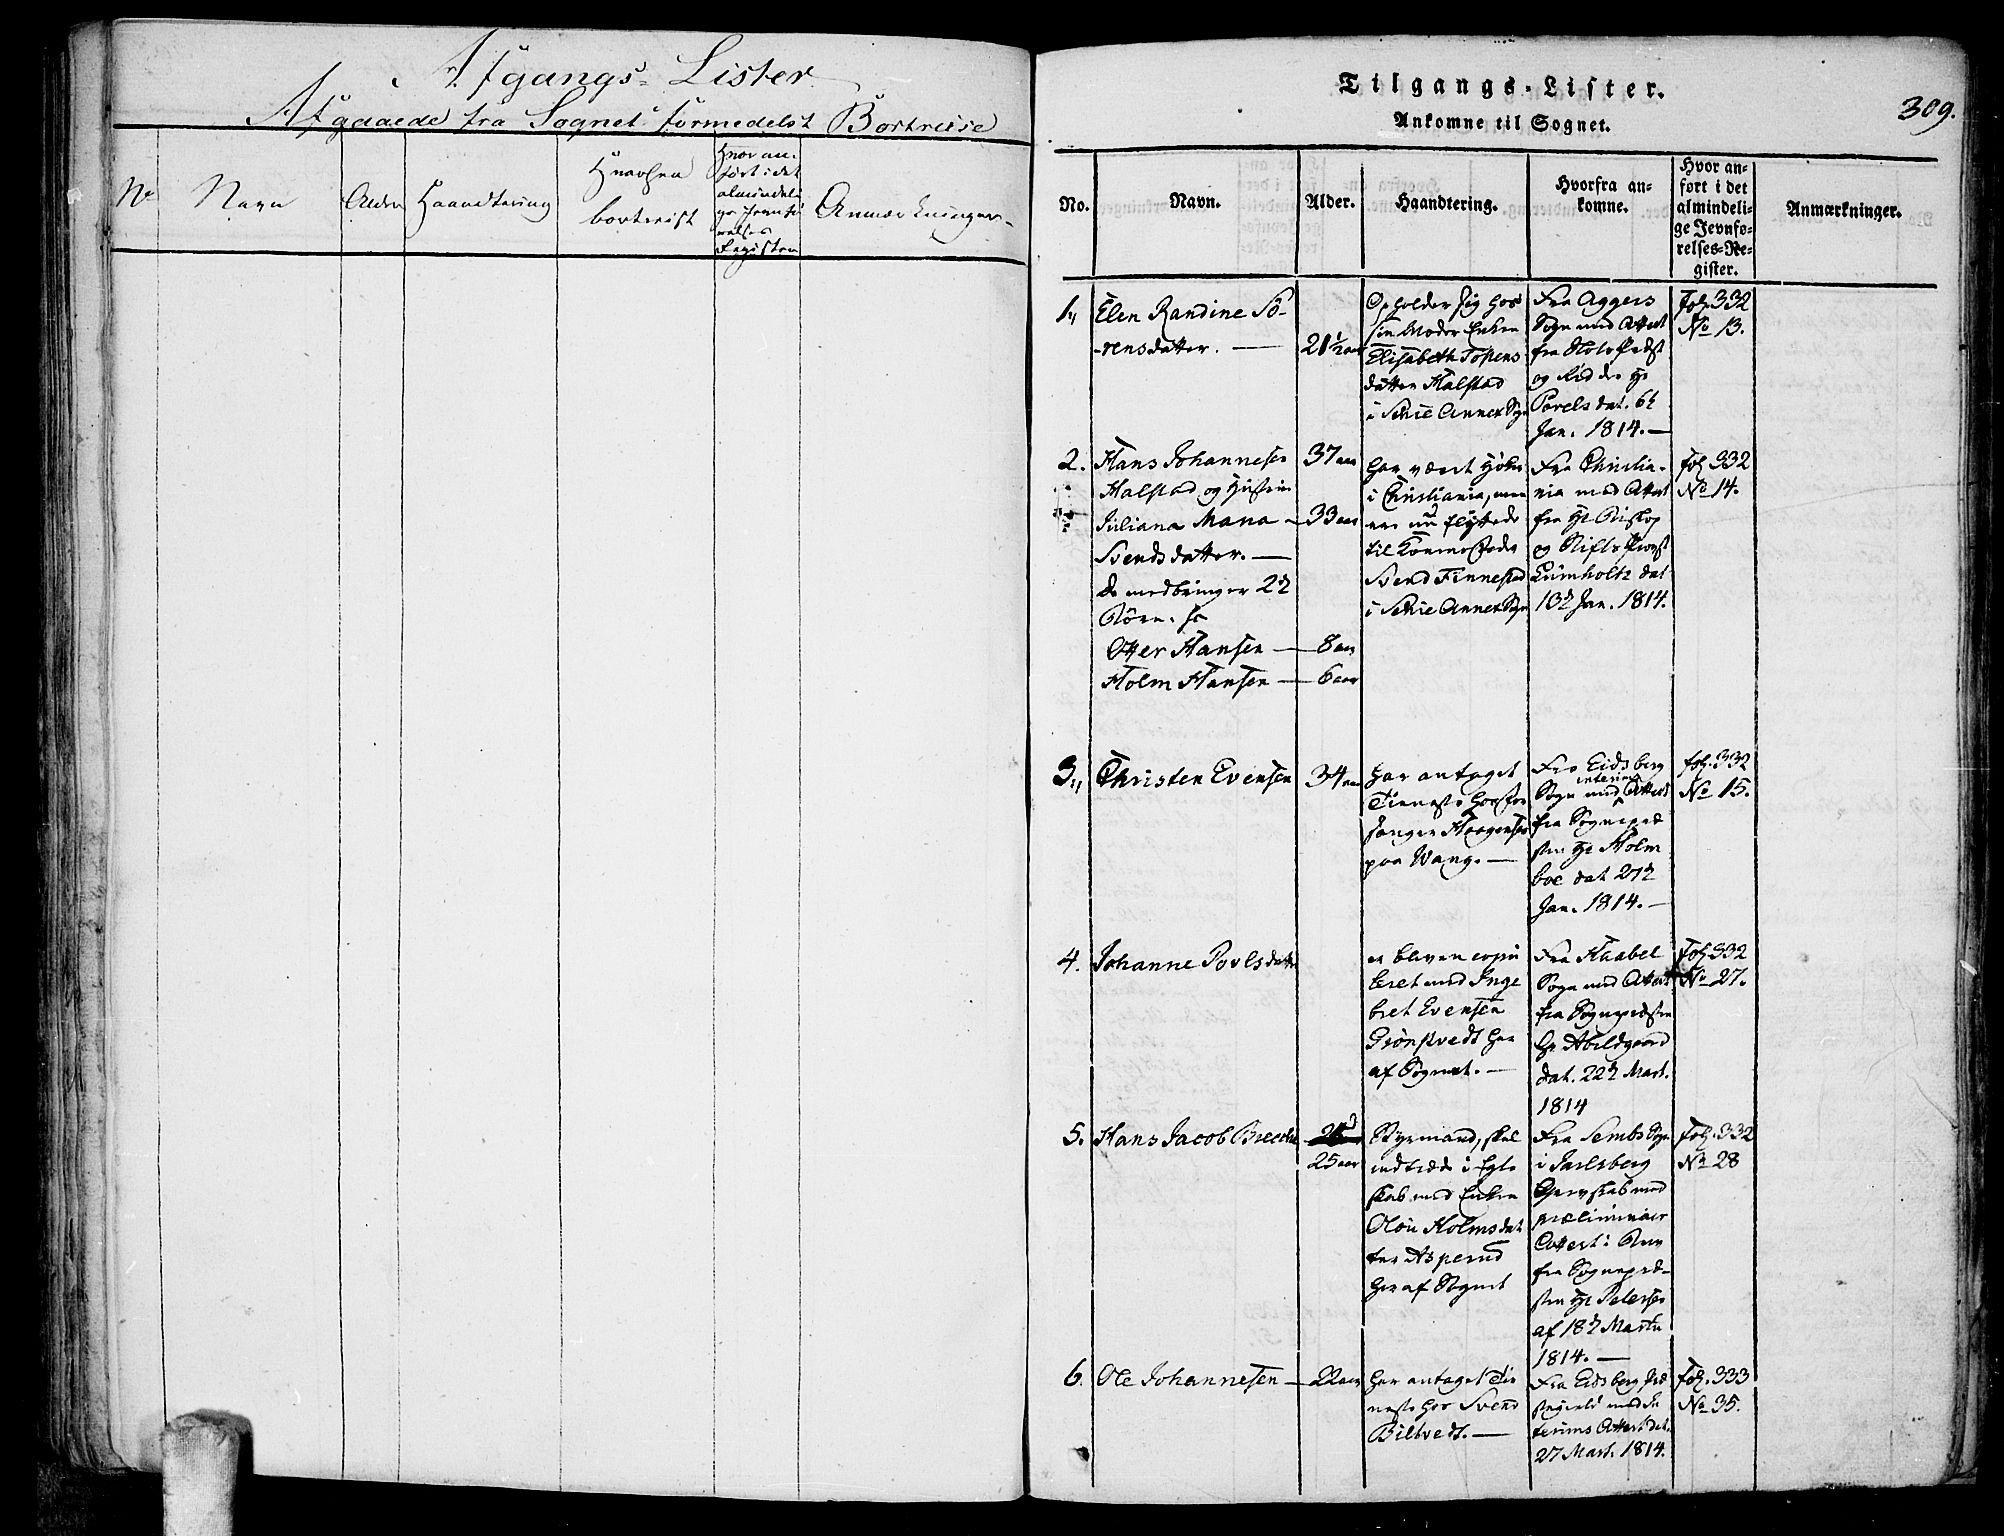 SAO, Kråkstad prestekontor Kirkebøker, F/Fa/L0003: Ministerialbok nr. I 3, 1813-1824, s. 309